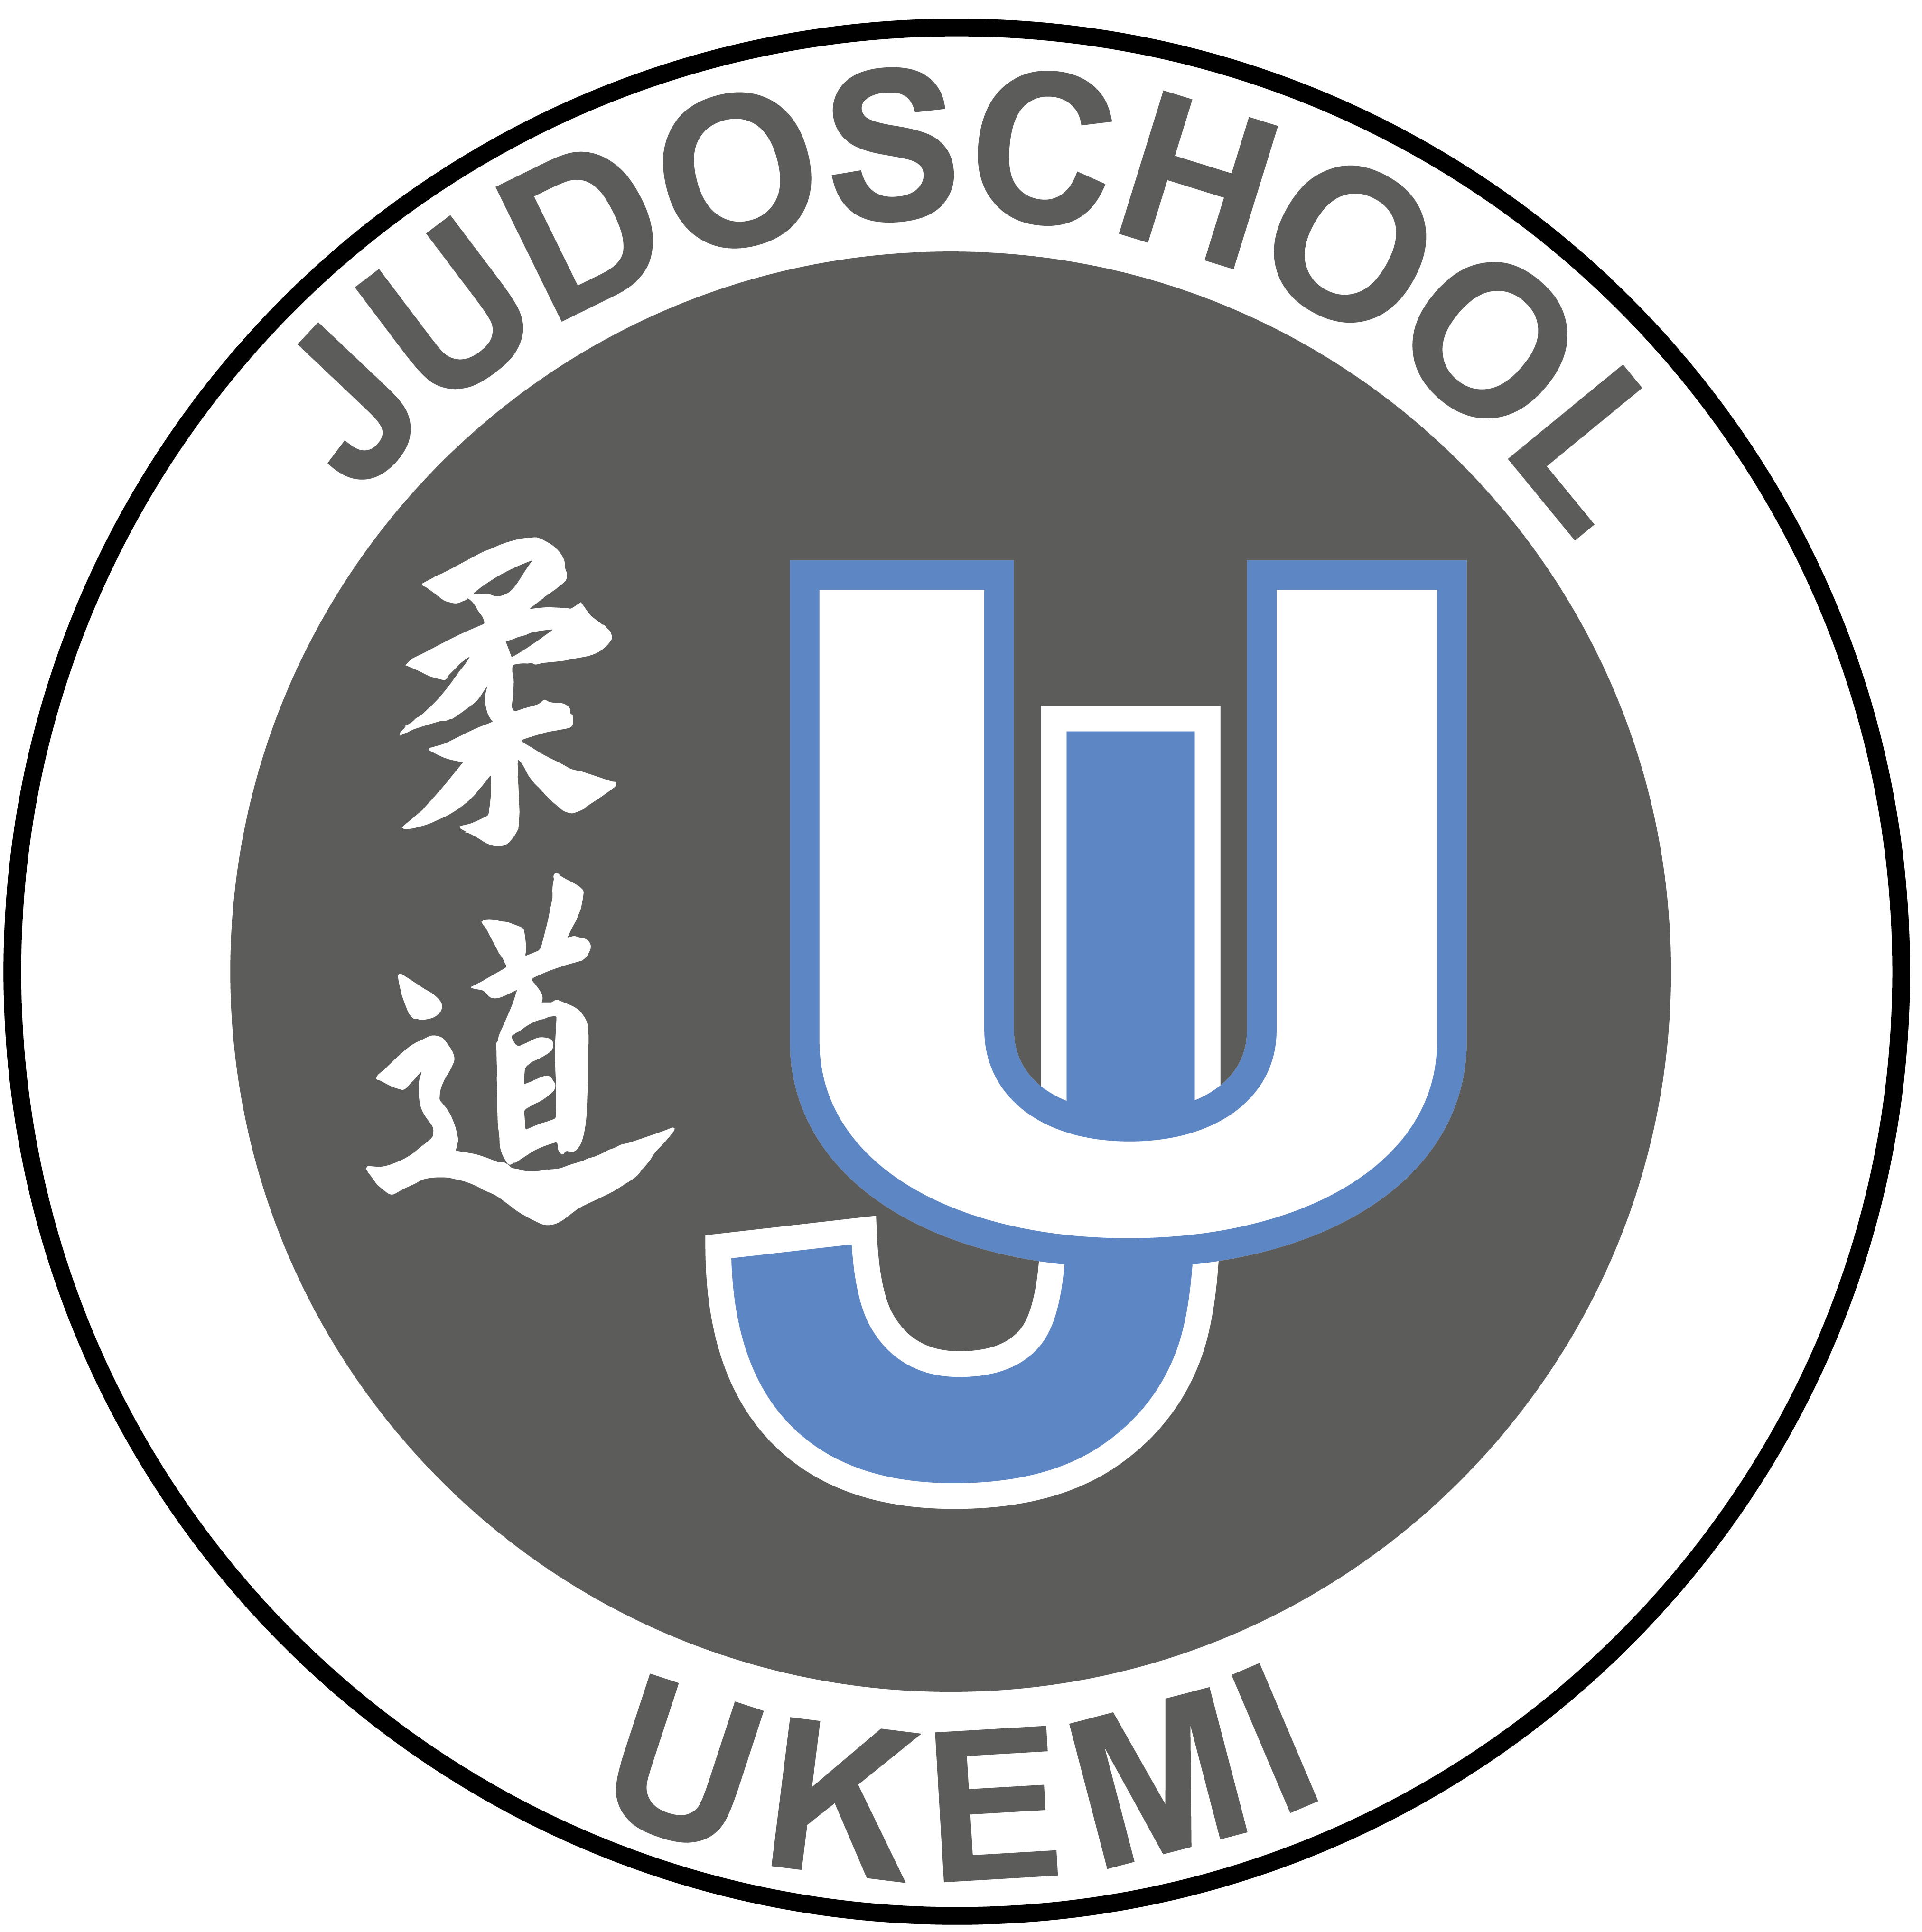 Judoschool Ukemi